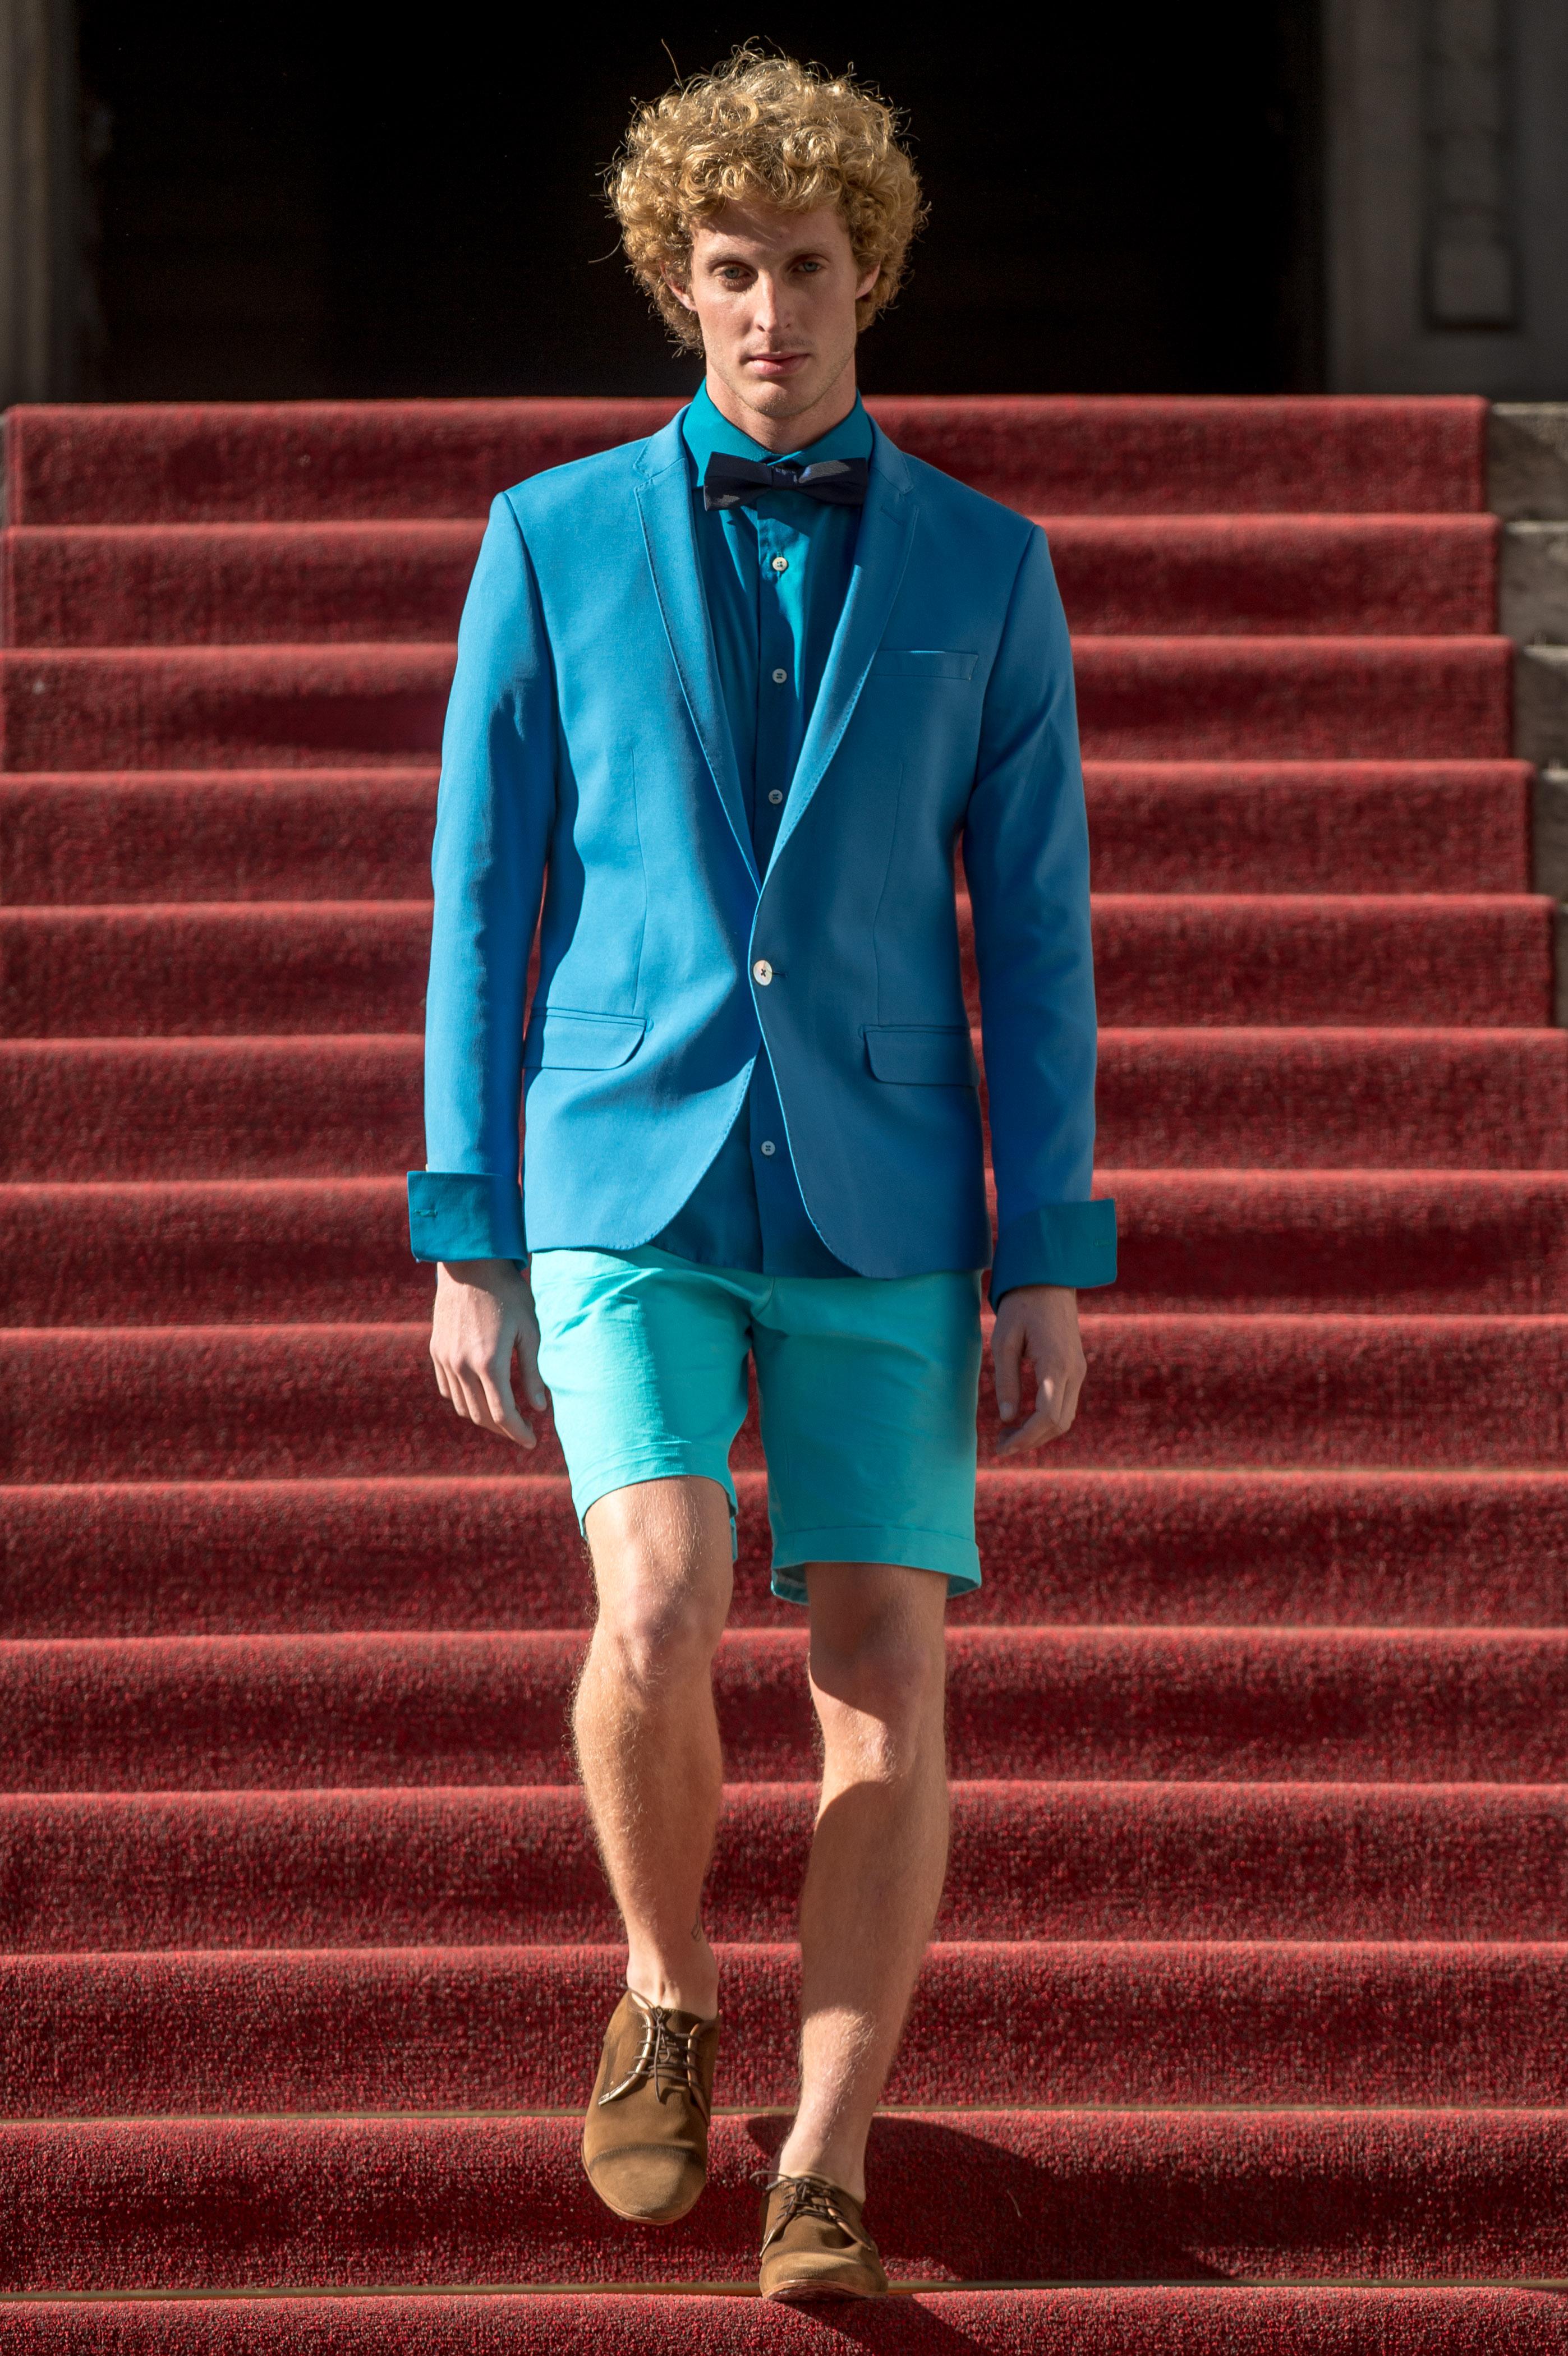 Ivan Aguilar: O mix de bermuda e blazer com gravata borboleta - Foto: Marcelo Soubhia/FOTOSITE